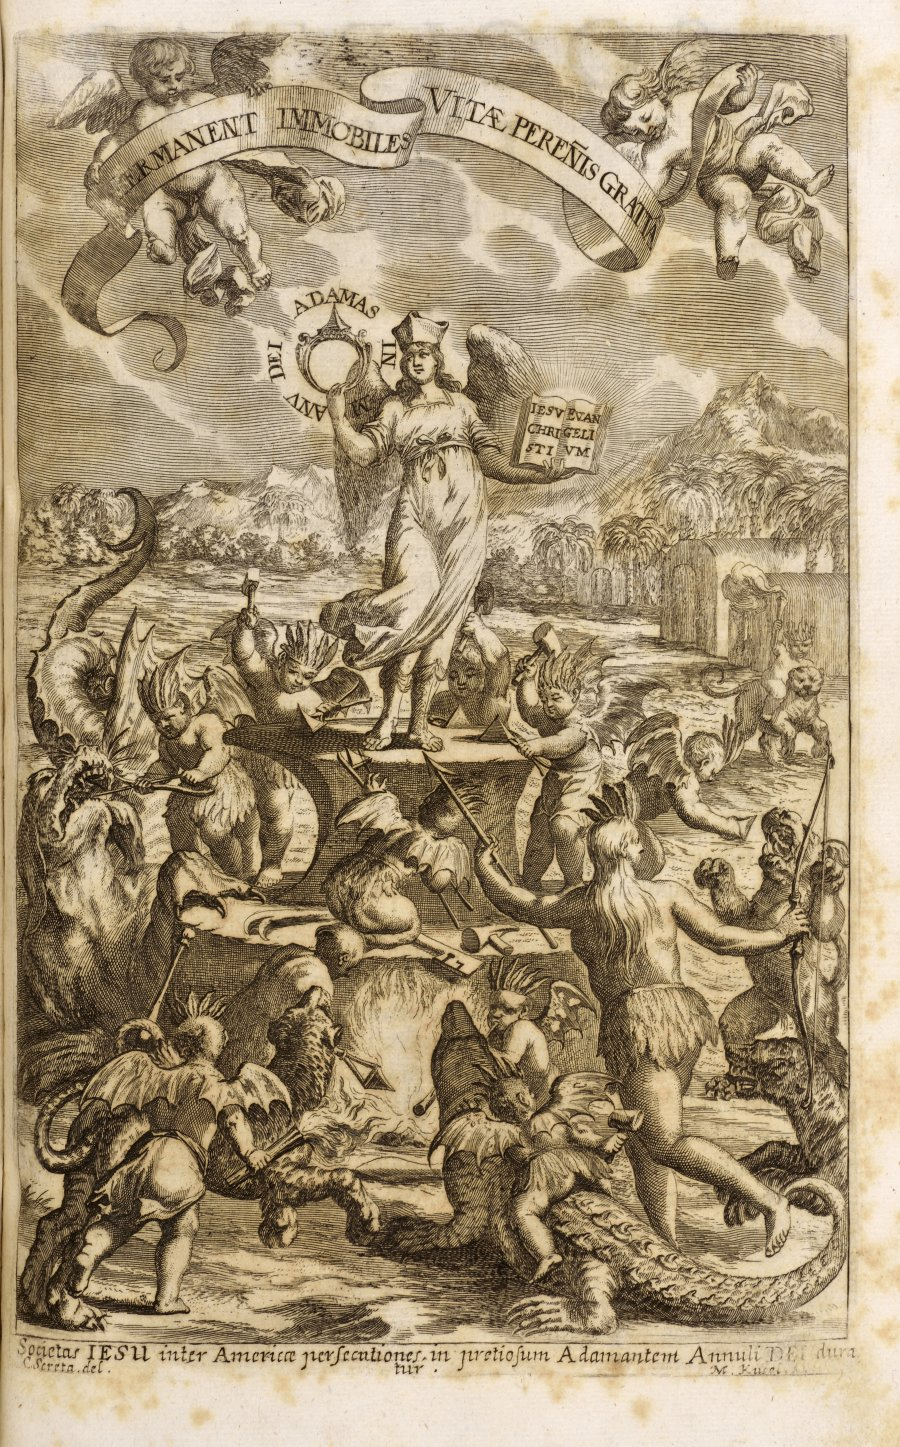 JESUITISCHES MARTYROLOGIUM